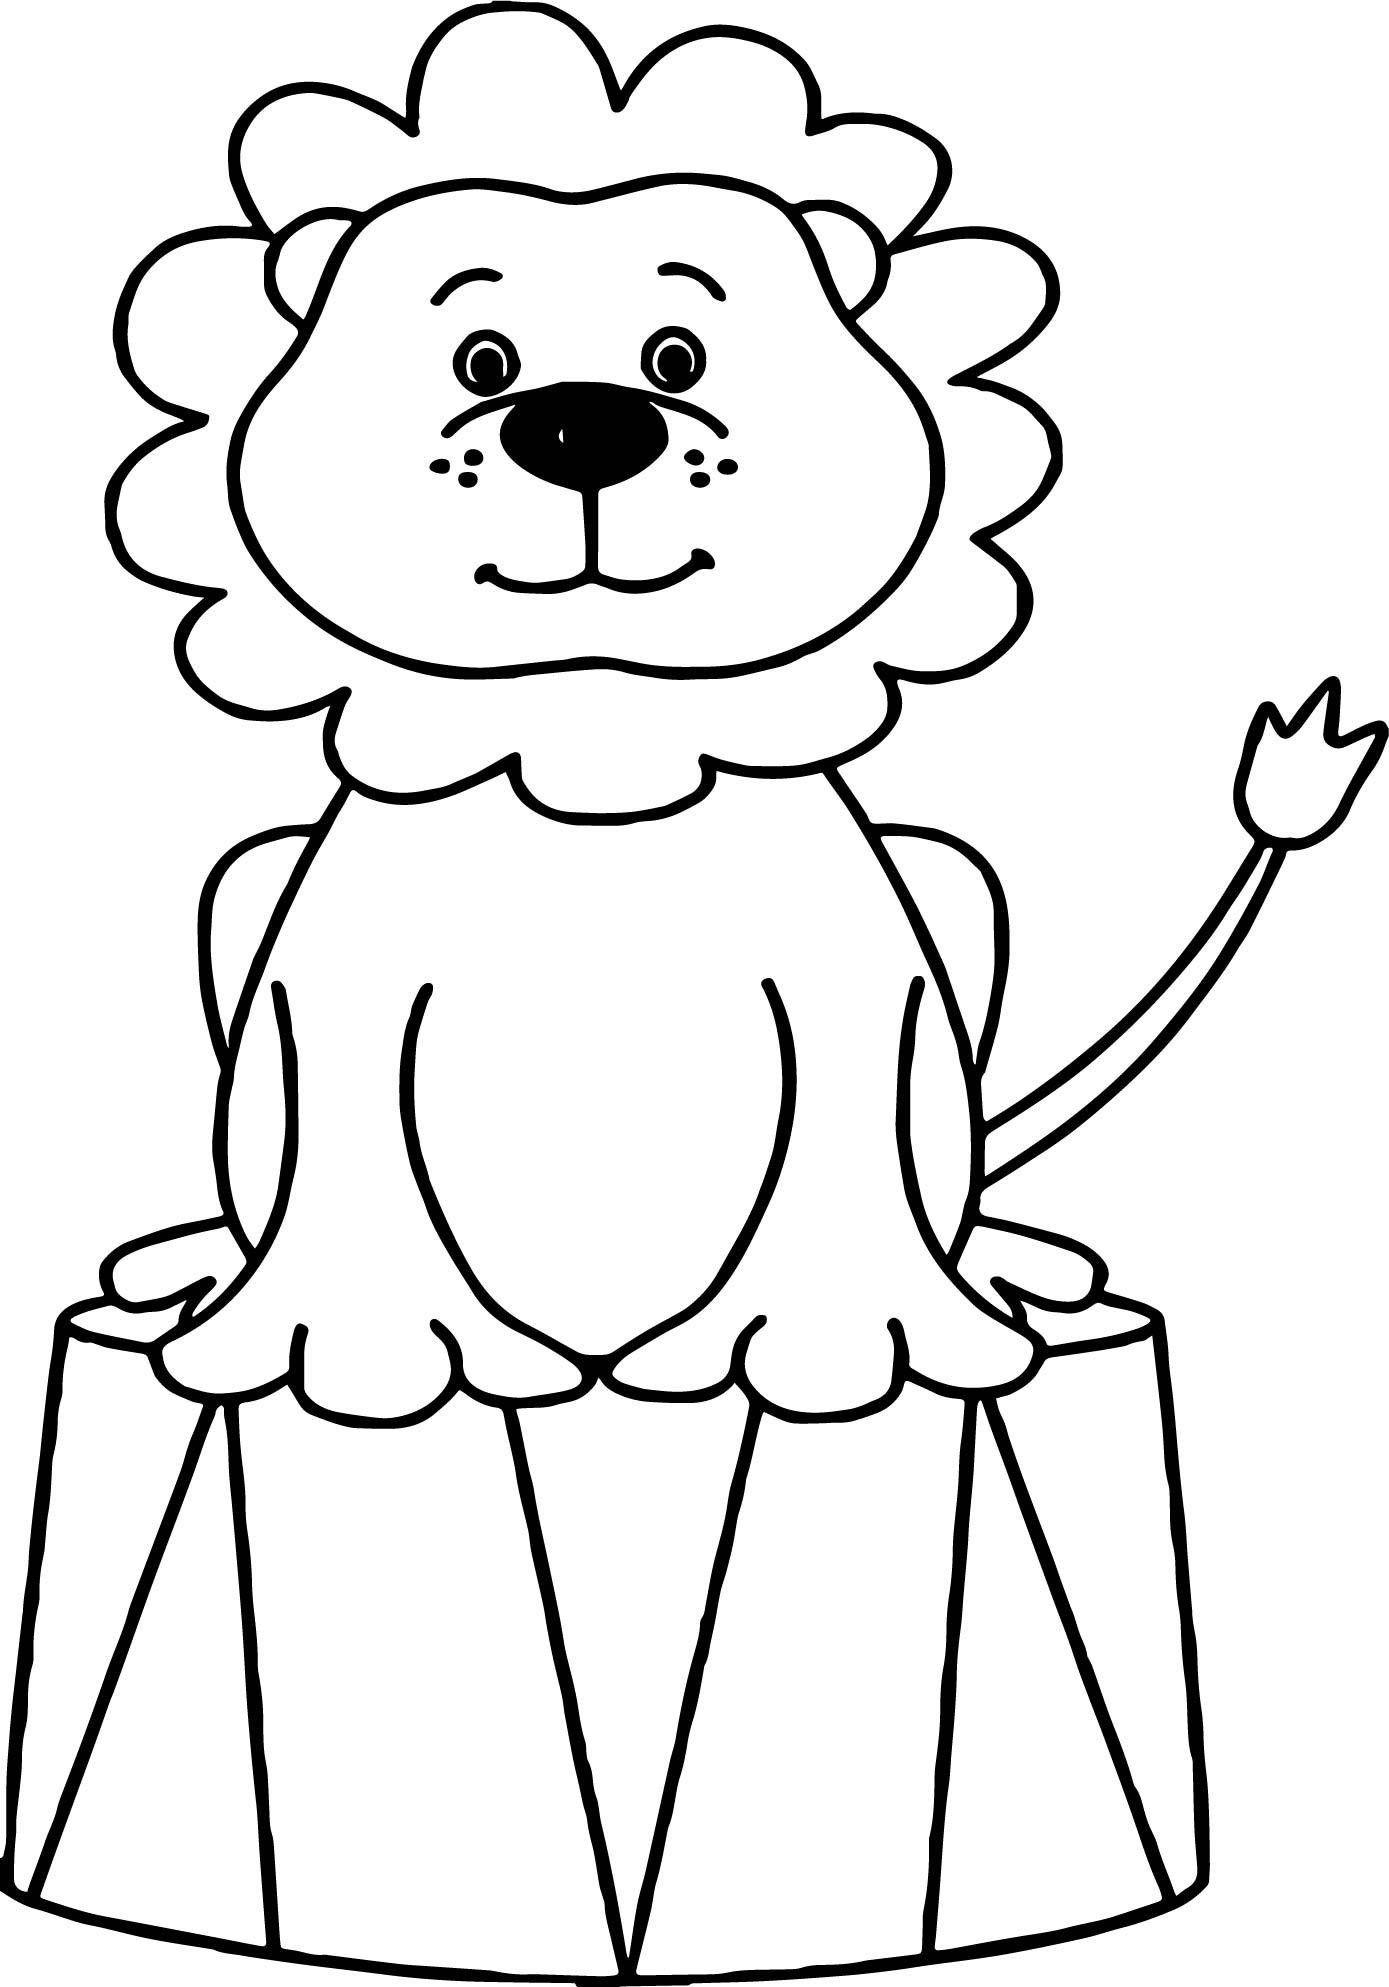 Coloring Coloringpages Coloringpagesforkids Coloringpagesforadult Lion Coloring Pages Animal Coloring Books Animal Coloring Pages